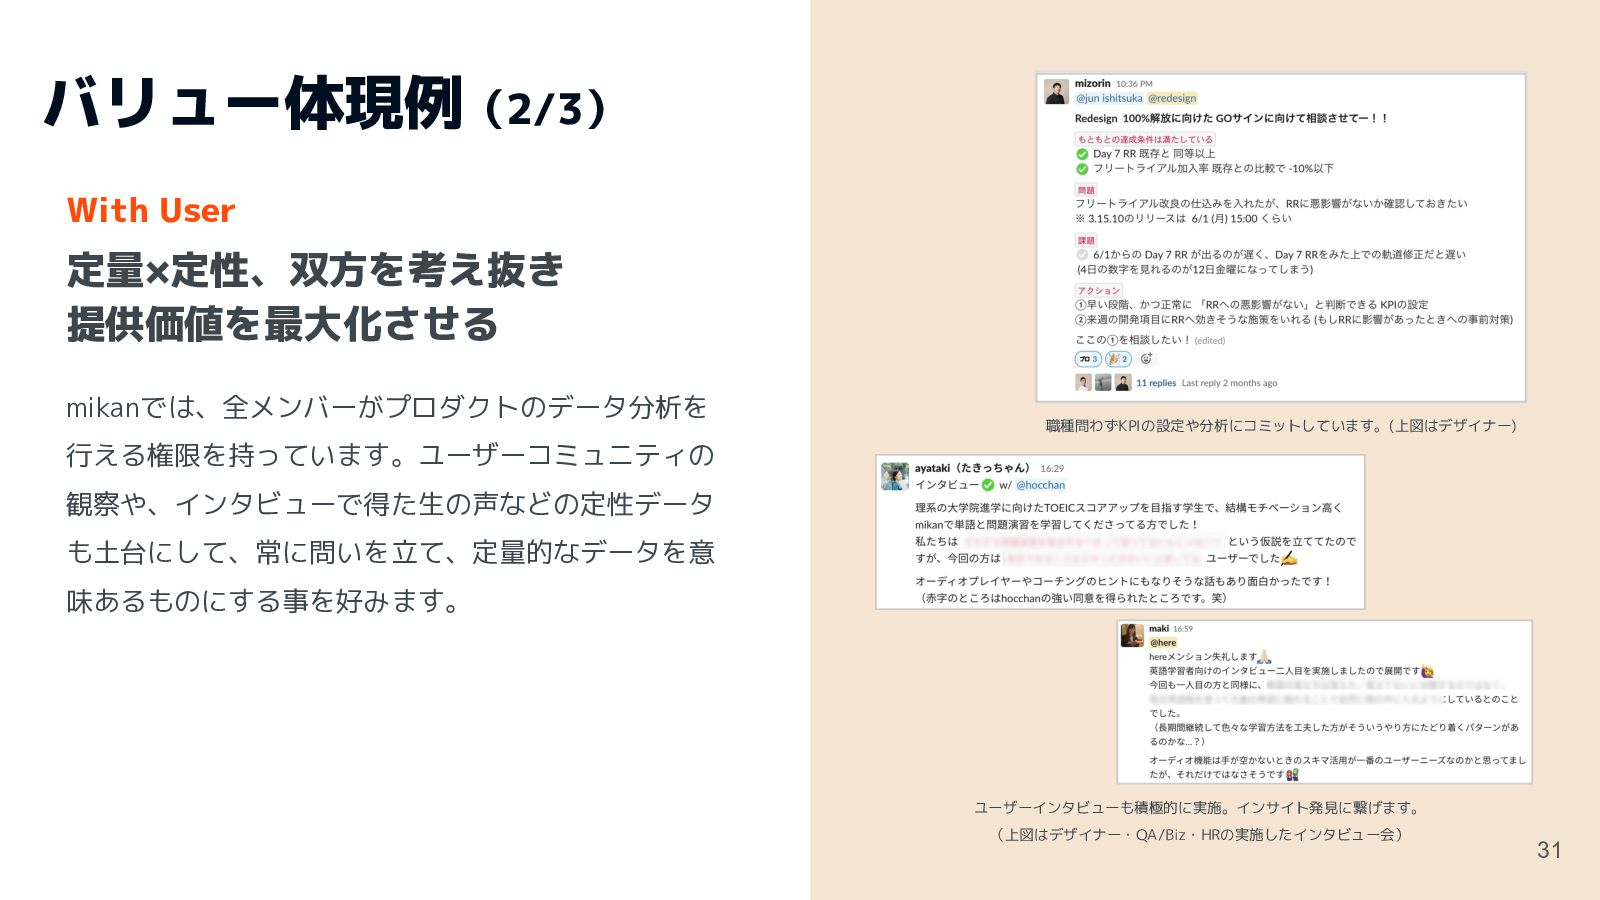 Care for Team バリュー体現例(3/3) チーム、個人単位での振り返りを注力 挑戦...